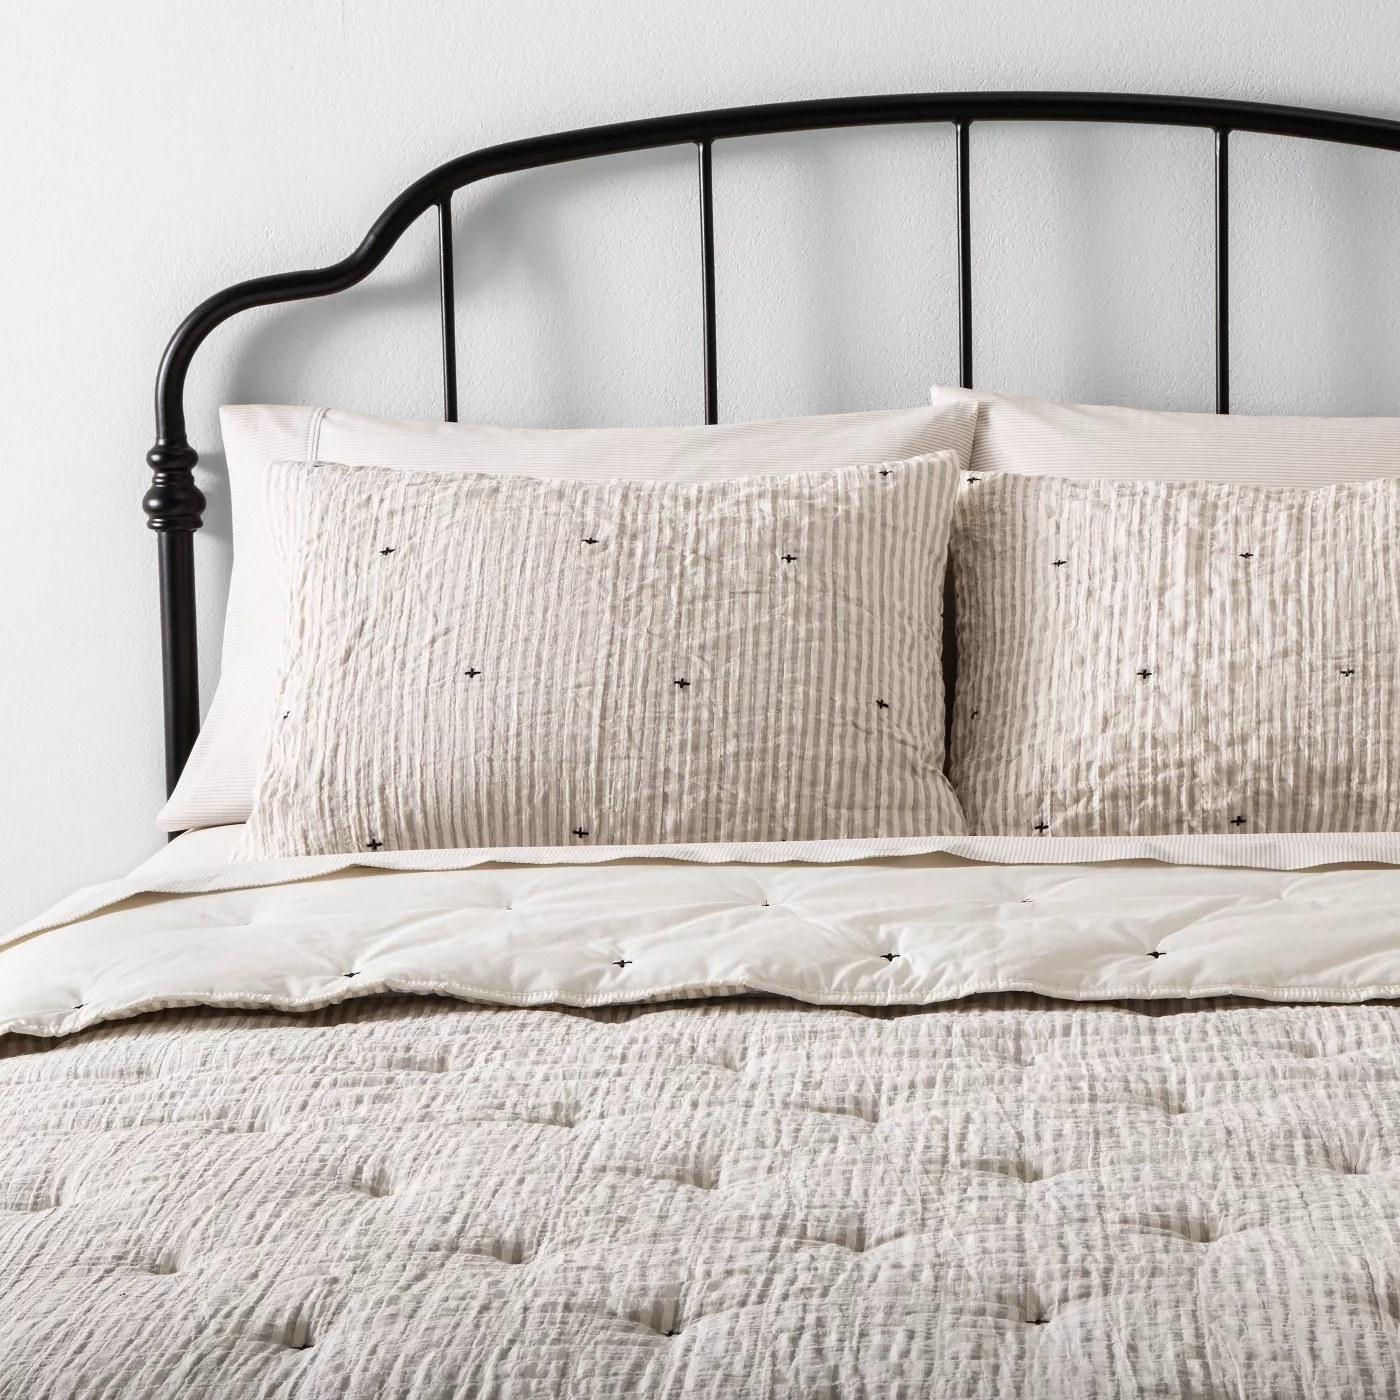 The comforter and sham set